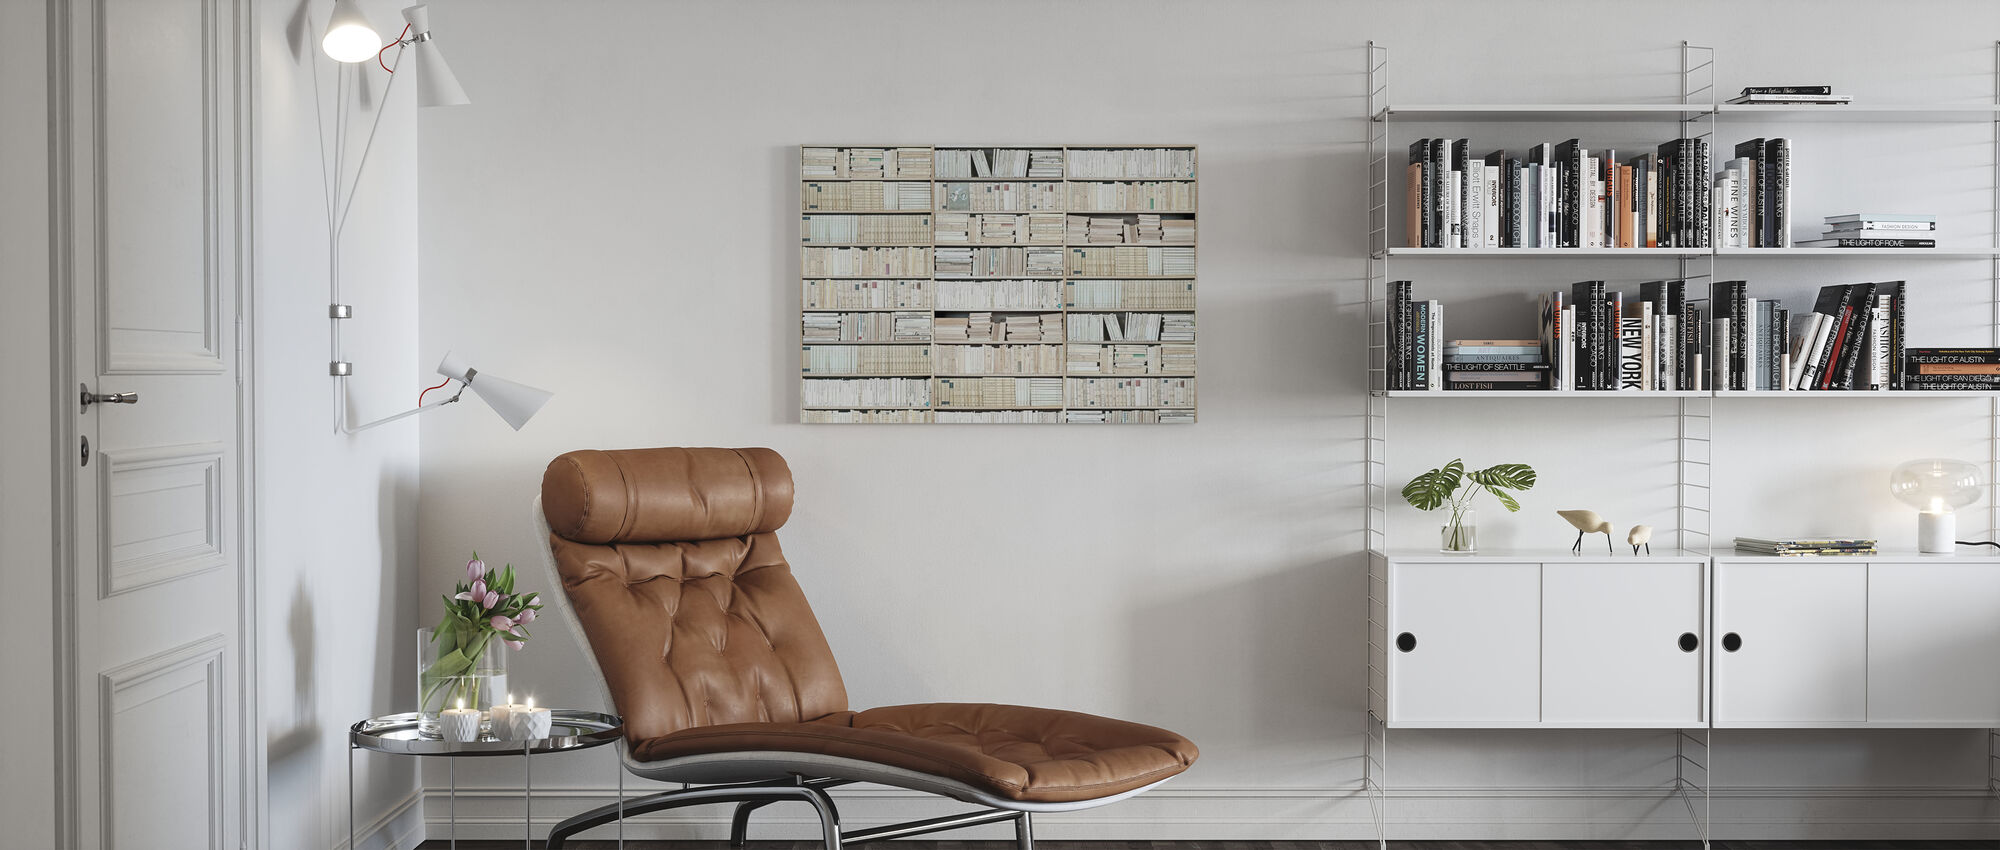 Bookshelf - White - Canvas print - Living Room